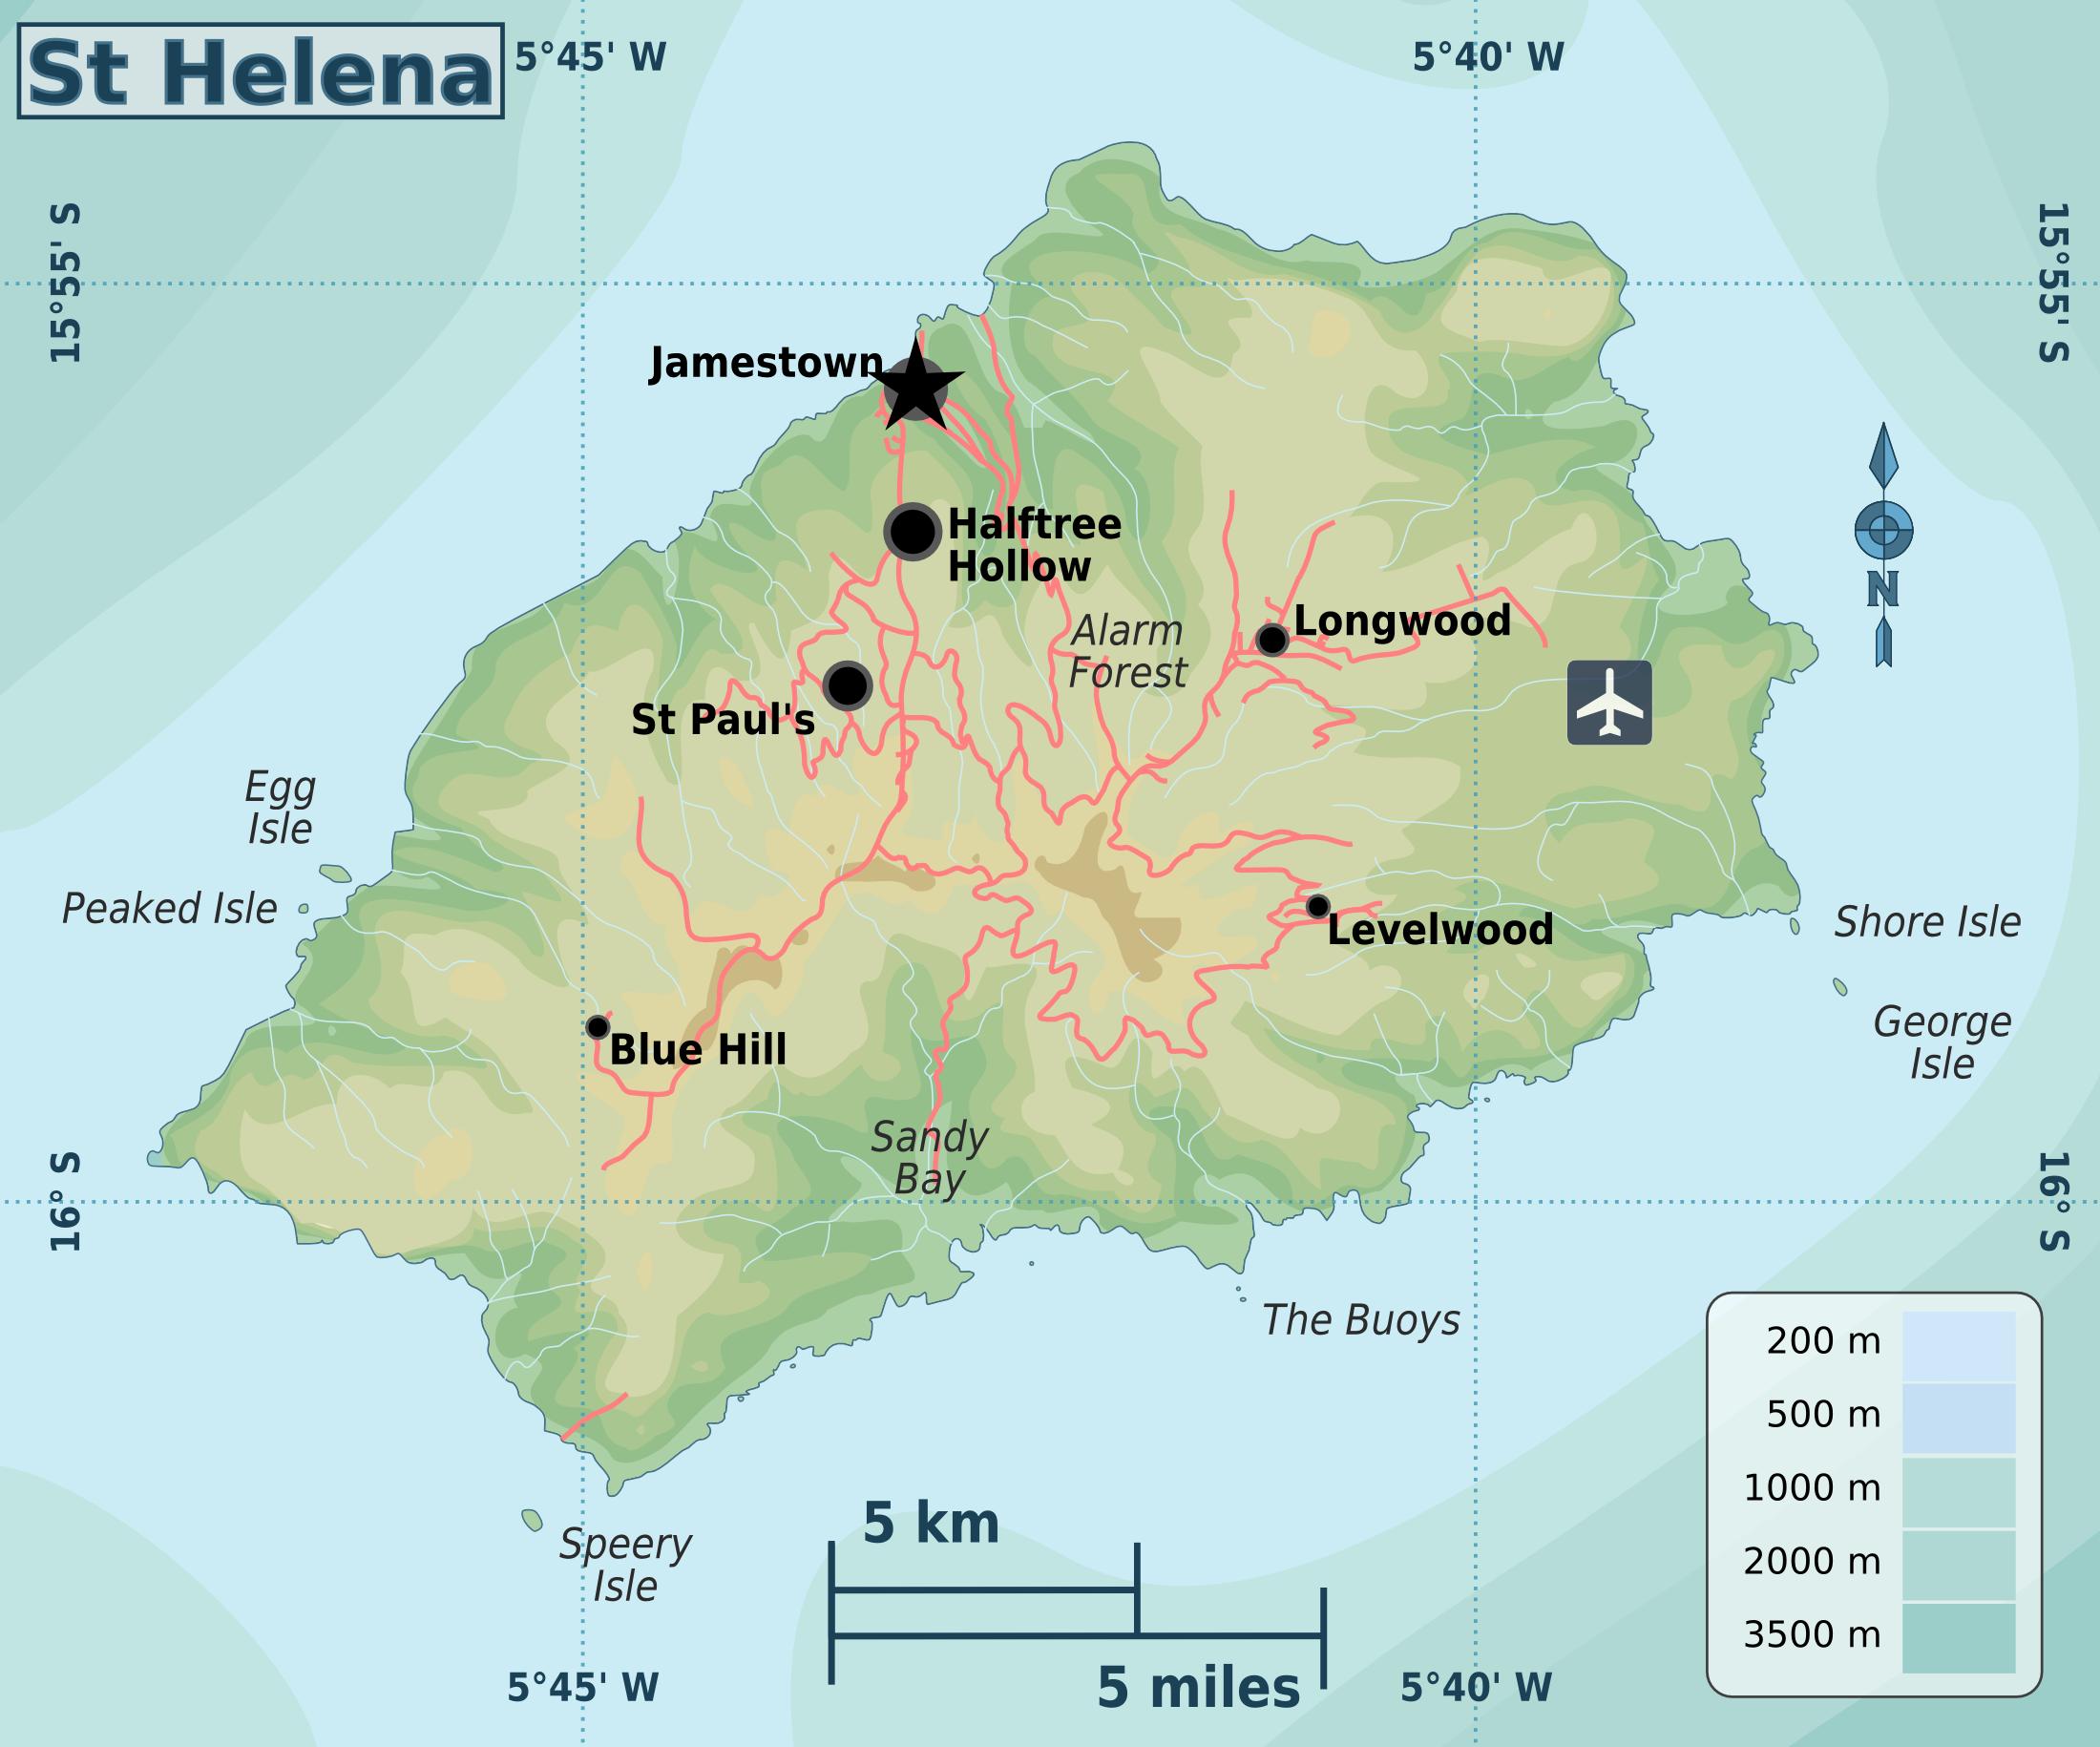 File:Saint Helena regions map.png – Travel guide at Wikivoyage on dominican republic map, samoa map, mayotte map, saint colorado springs map, saint jerome map, south helena map, st. johns river fishing map, seychelles map, helena street map, cape verde map, reunion map, mozambique map, st. helena california map, tuvalu map, saint michael map, tensas map, madeira map, senegal map, tokelau map, nauru map,